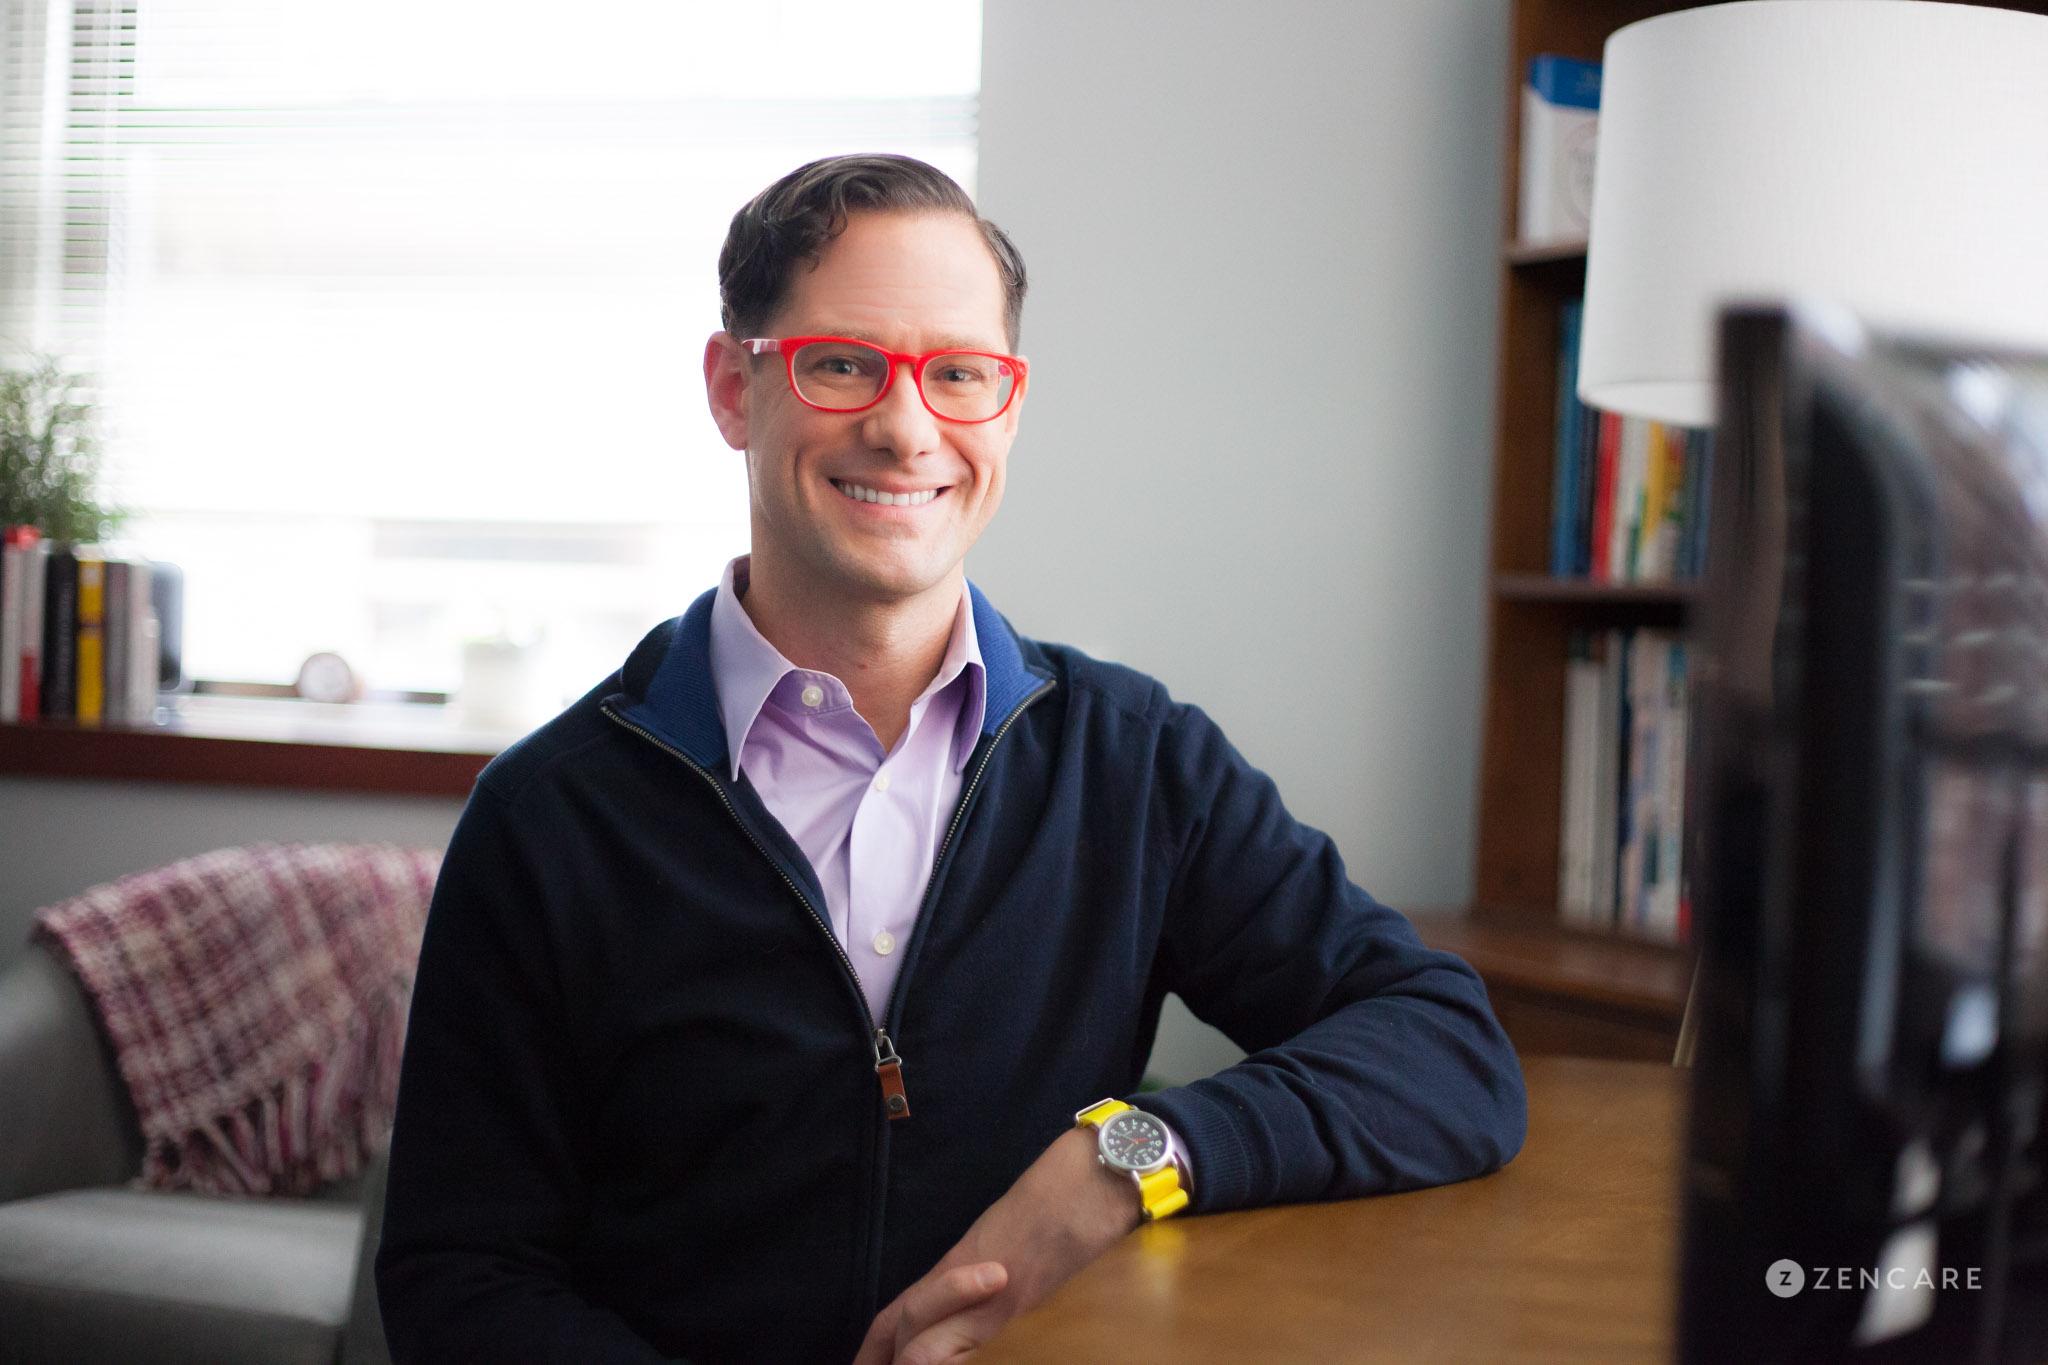 Doug Dimartile - counselor in Boston -6.jpg